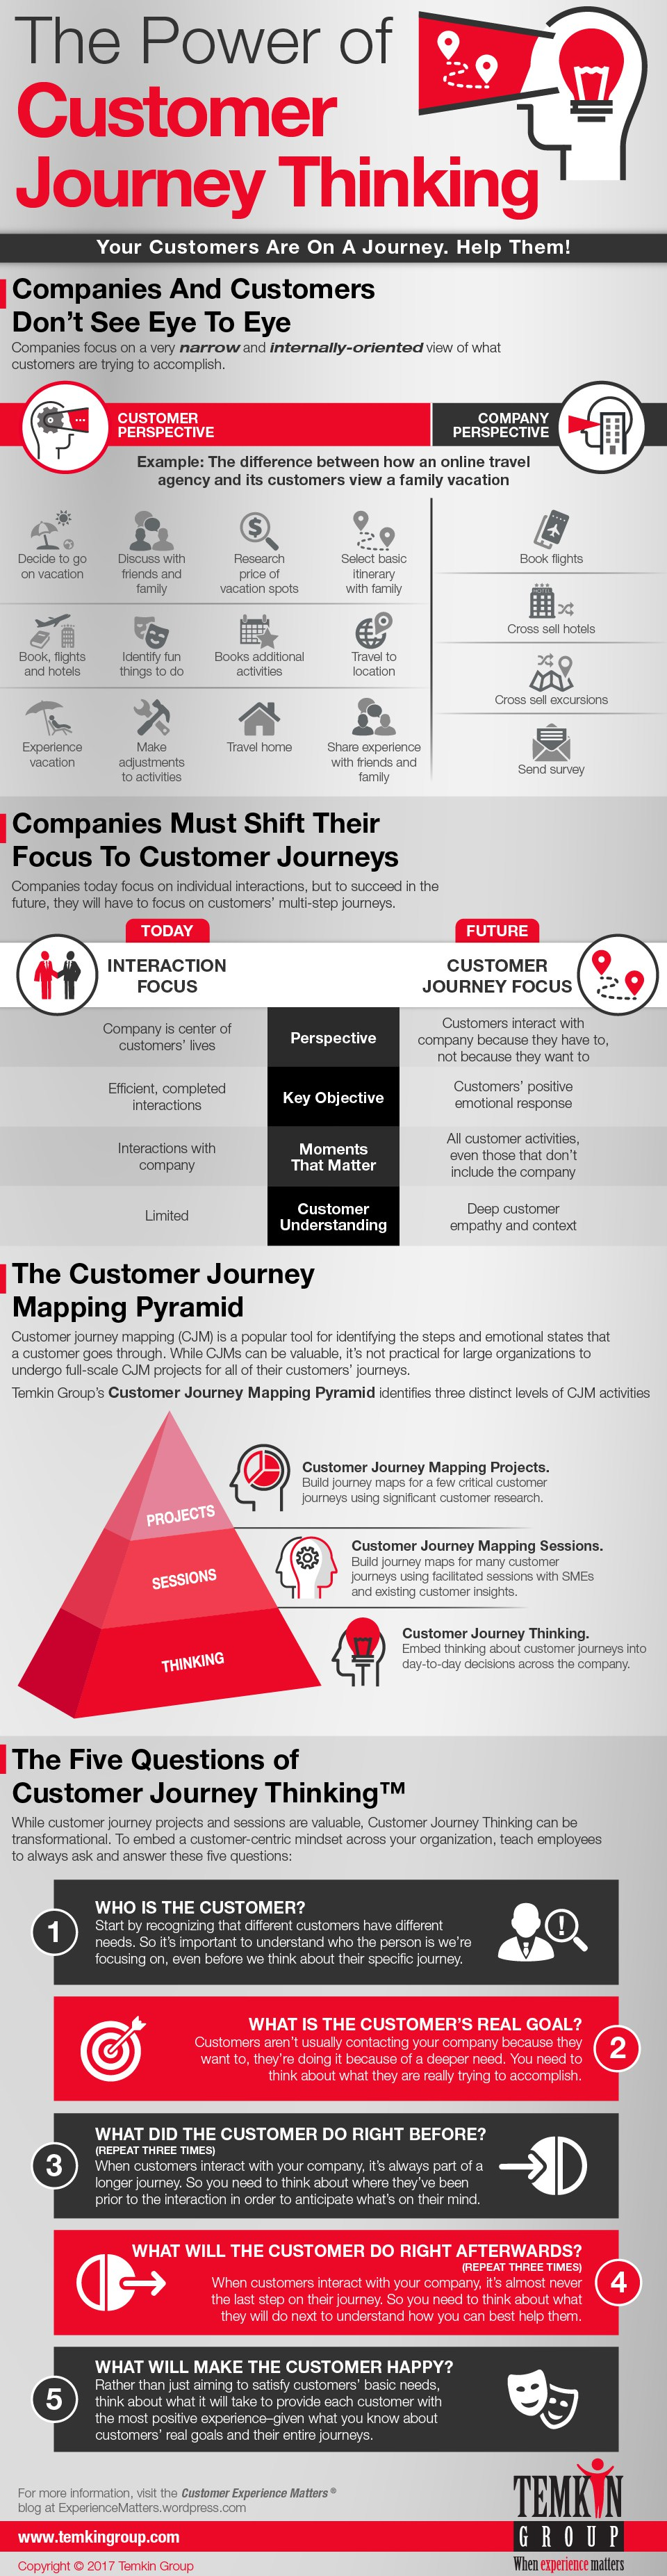 PowerOfCustomerJourneyThinking_infographic